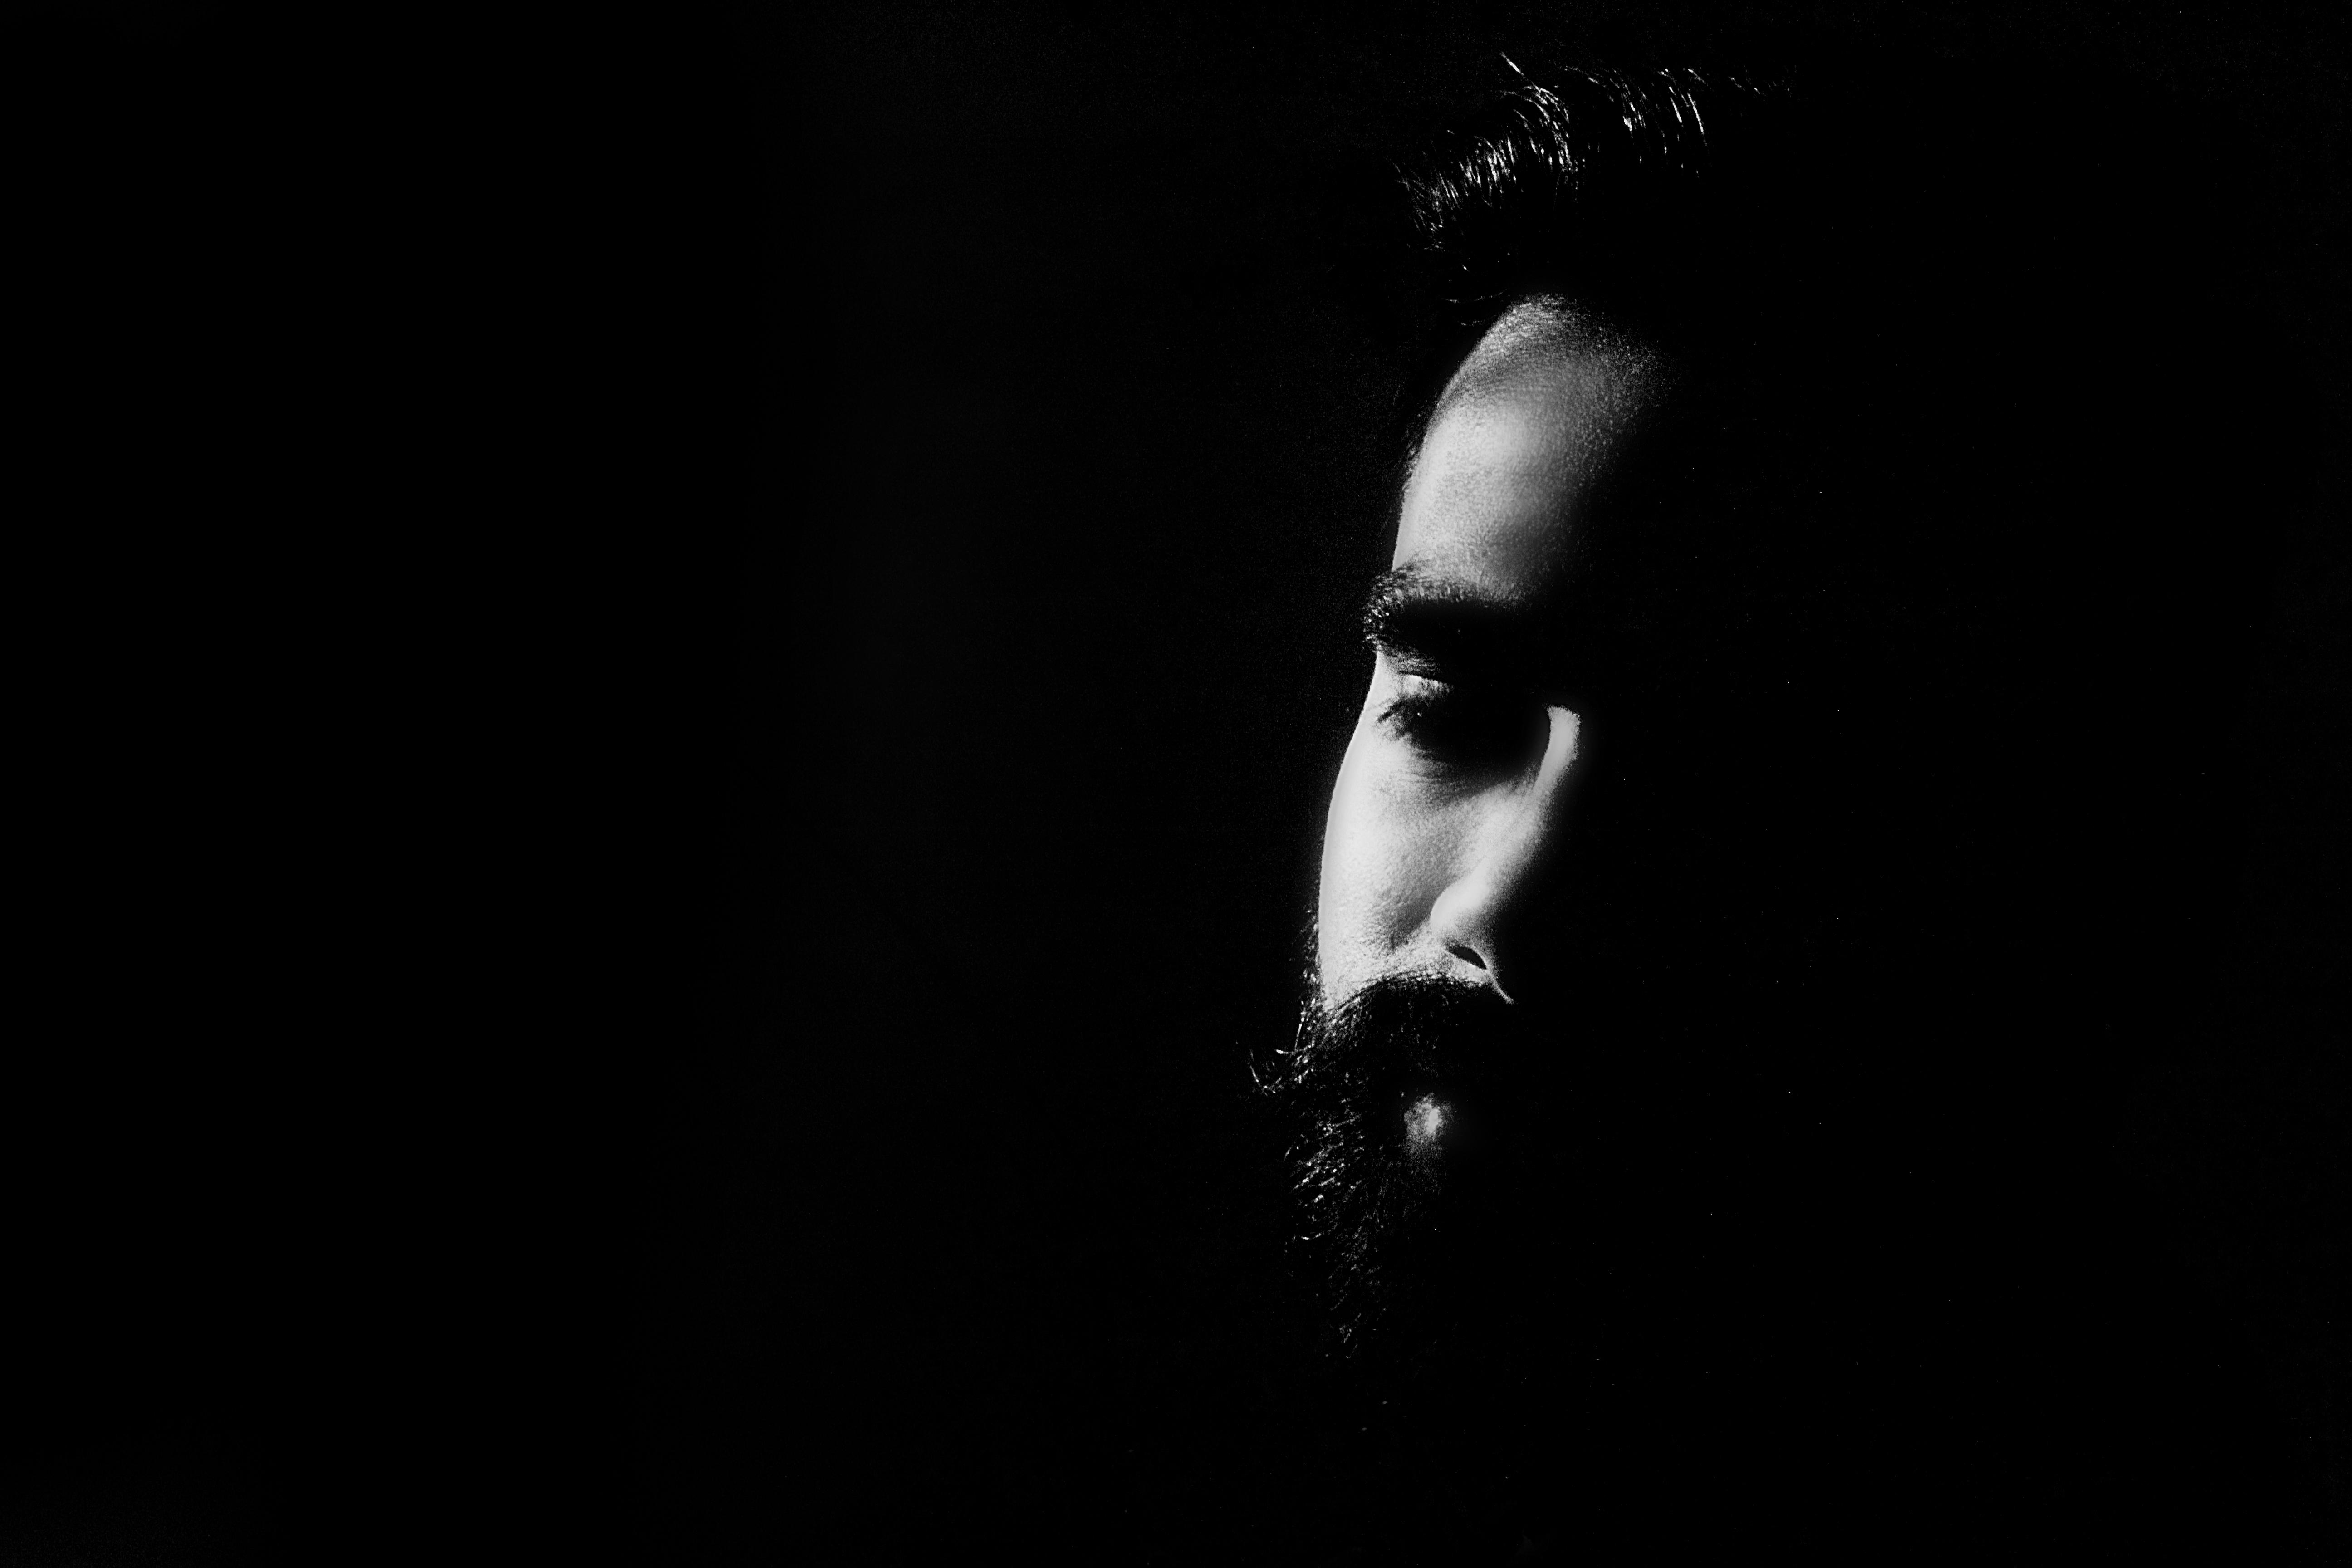 Hand man person light black and white photography dark male darkness black monochrome beard monochrome photography